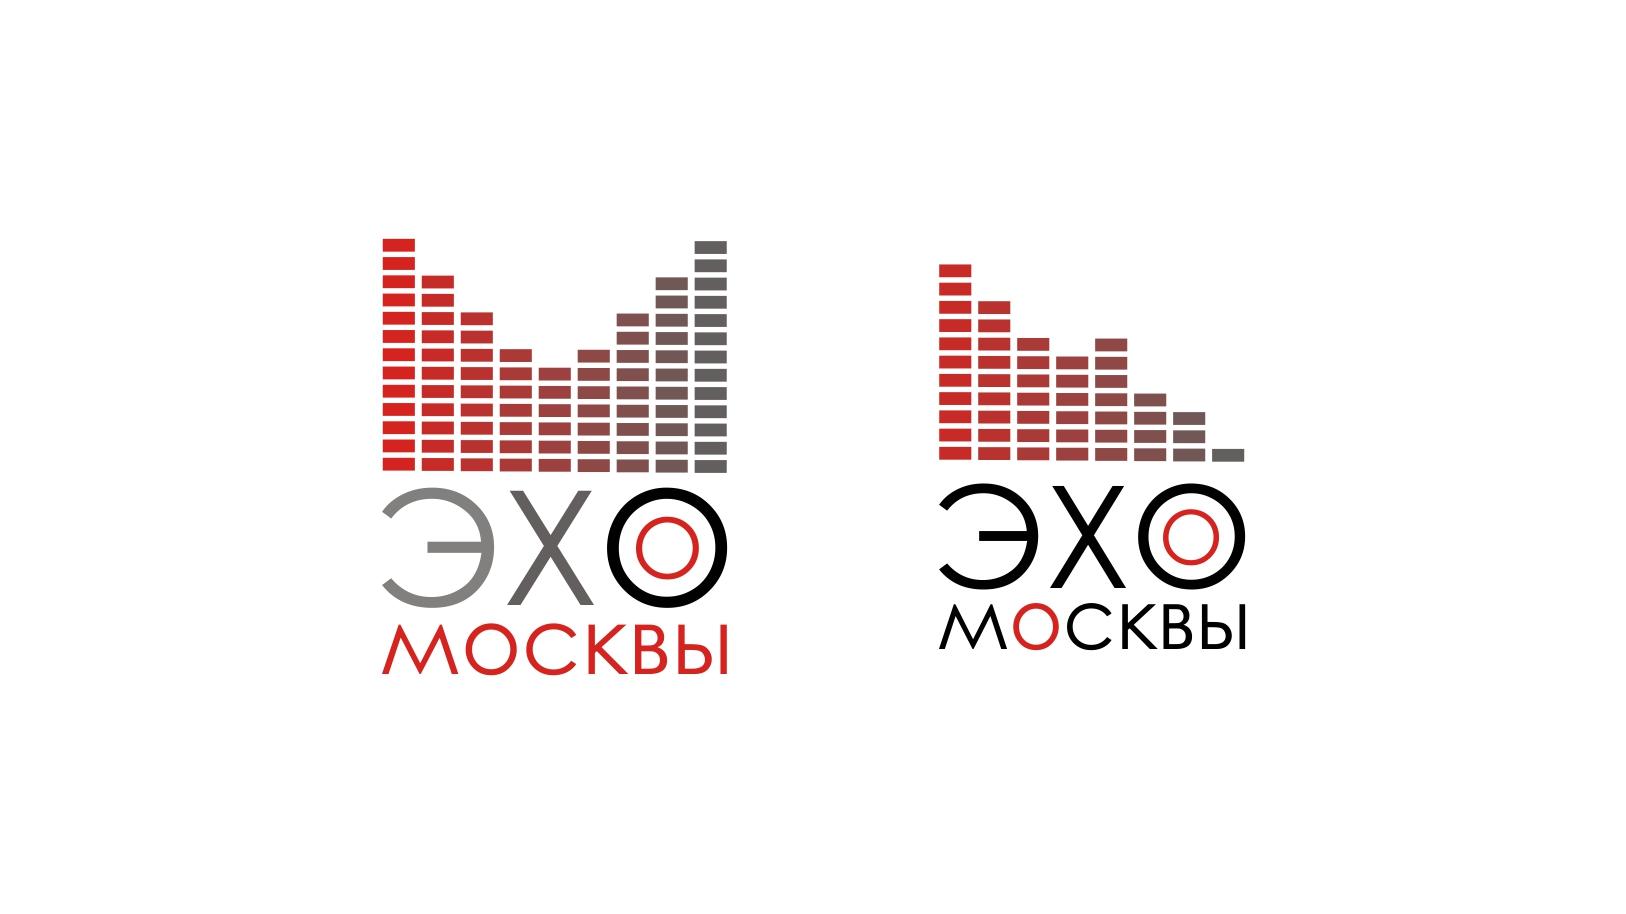 Дизайн логотипа р/с Эхо Москвы. фото f_9685624e17190e37.jpg